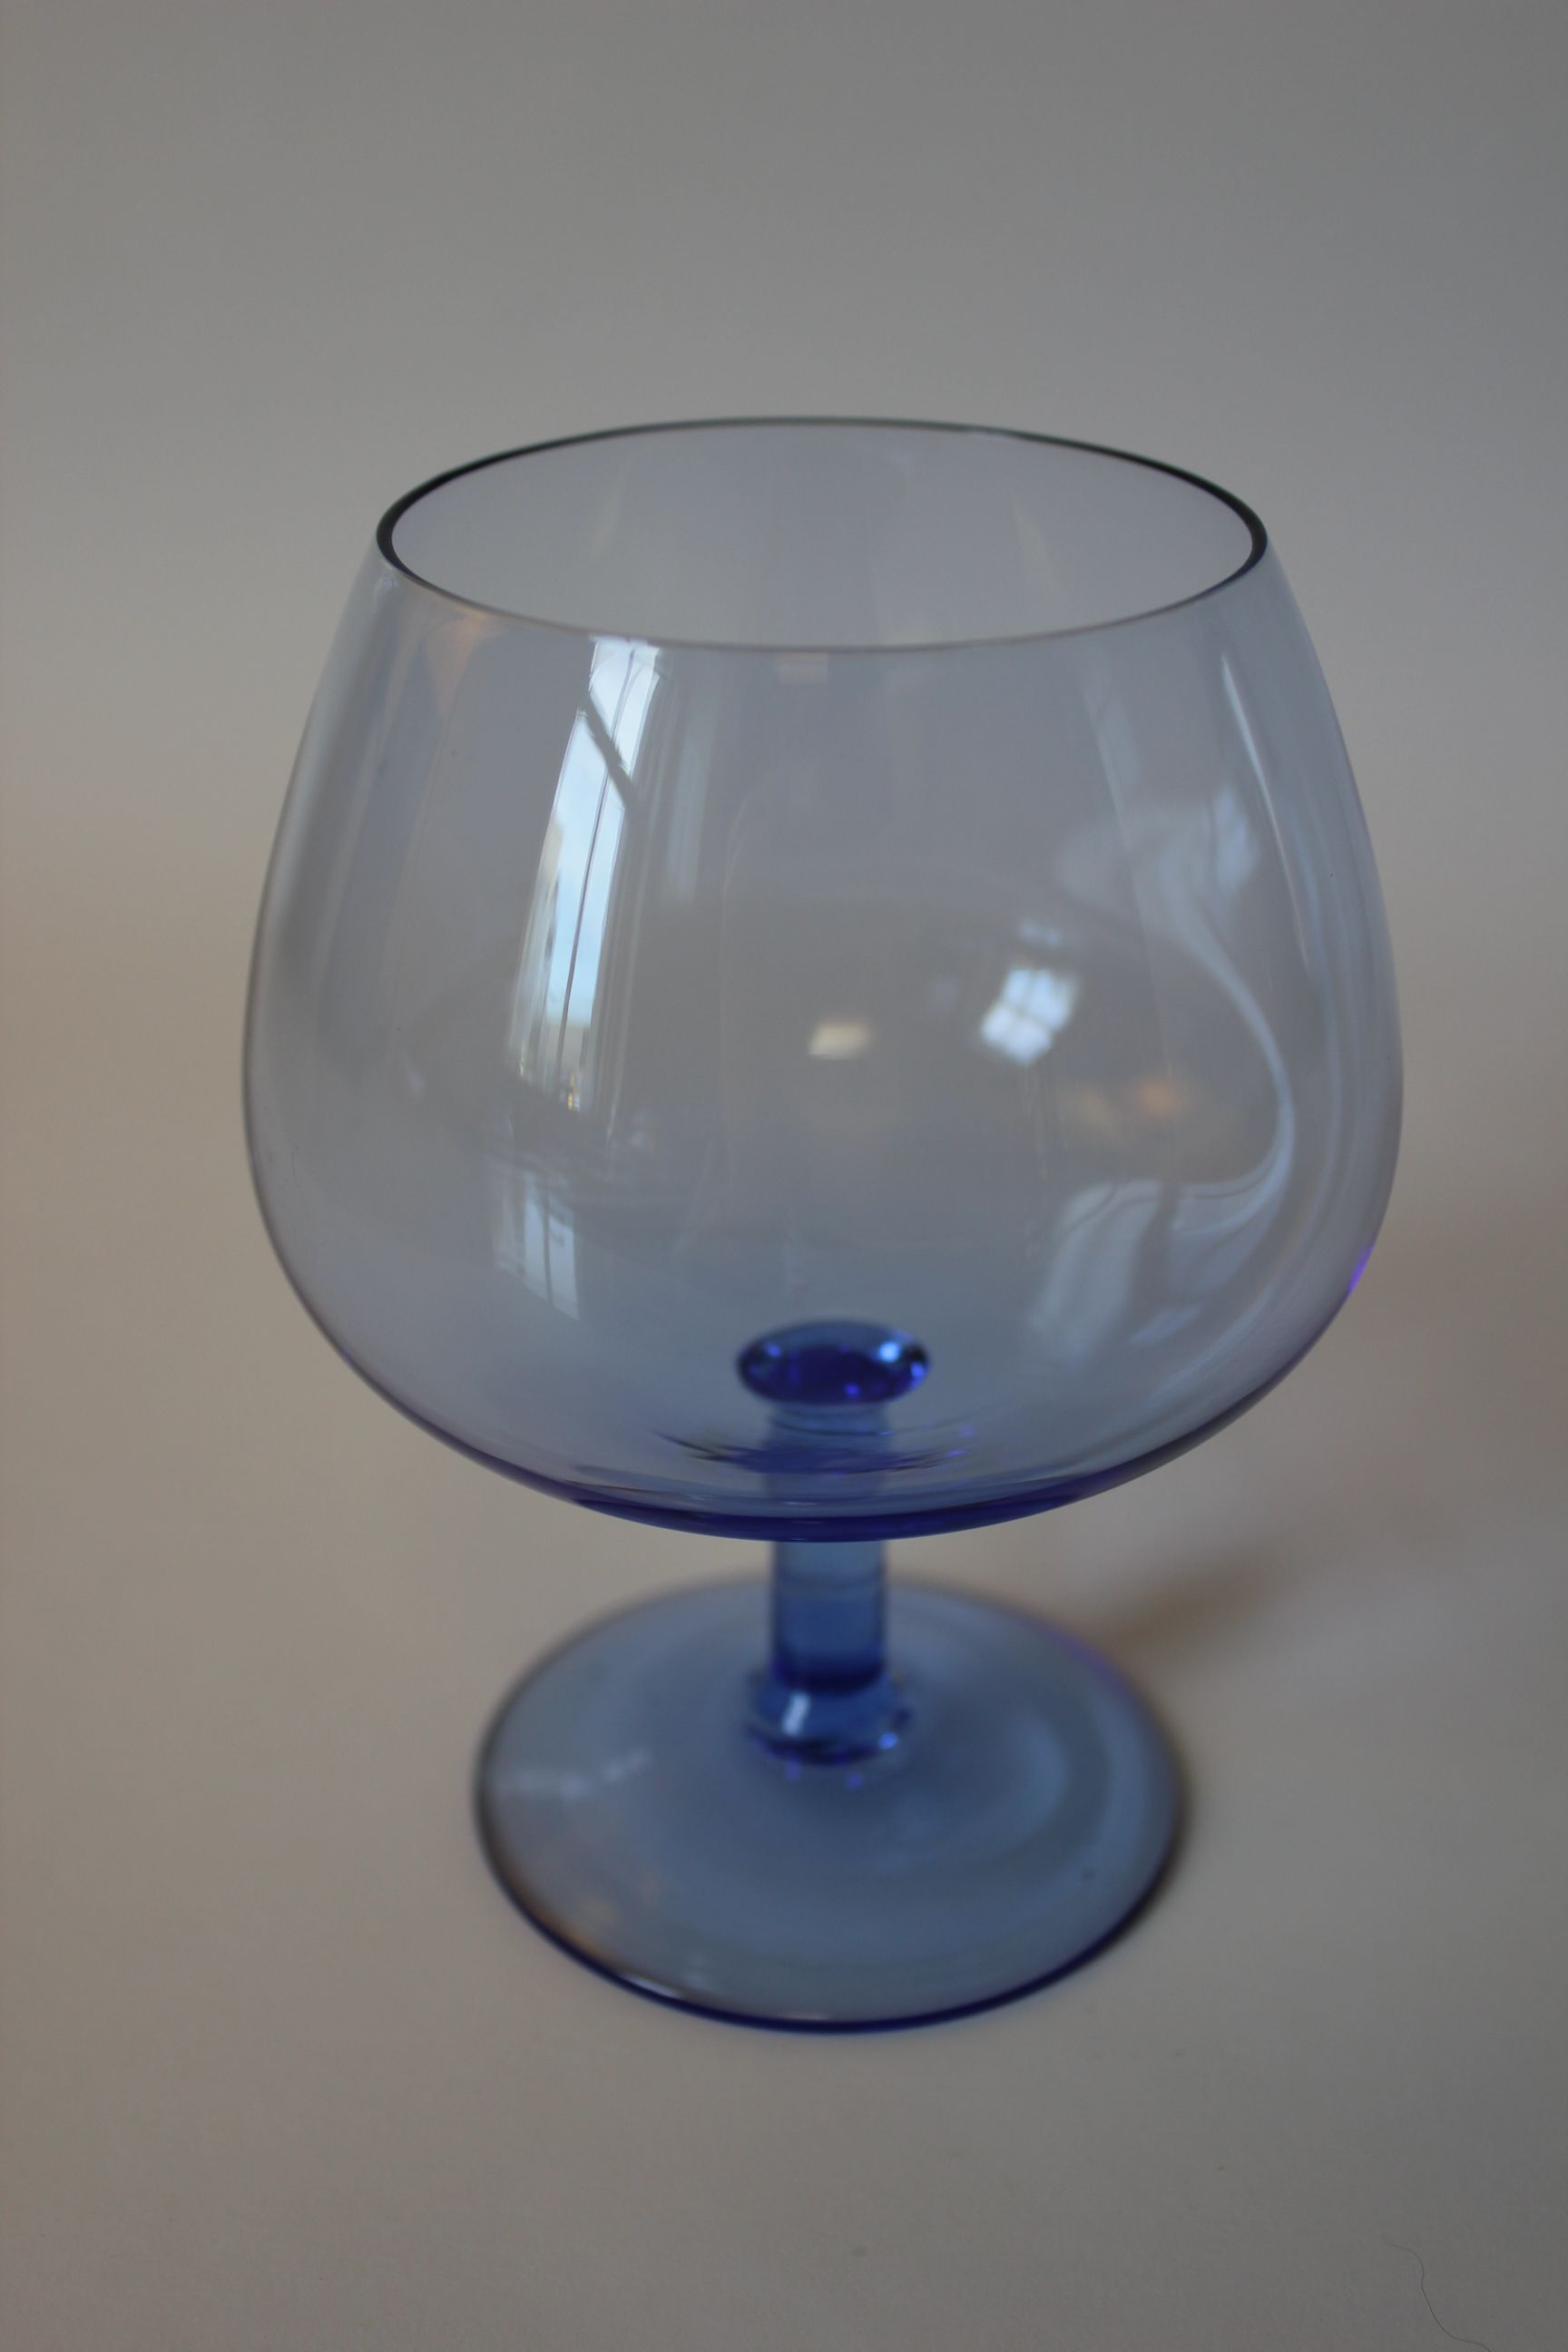 Cool little blue brandy balloon glass glasses the drinking kind cool little blue brandy balloon glass reviewsmspy